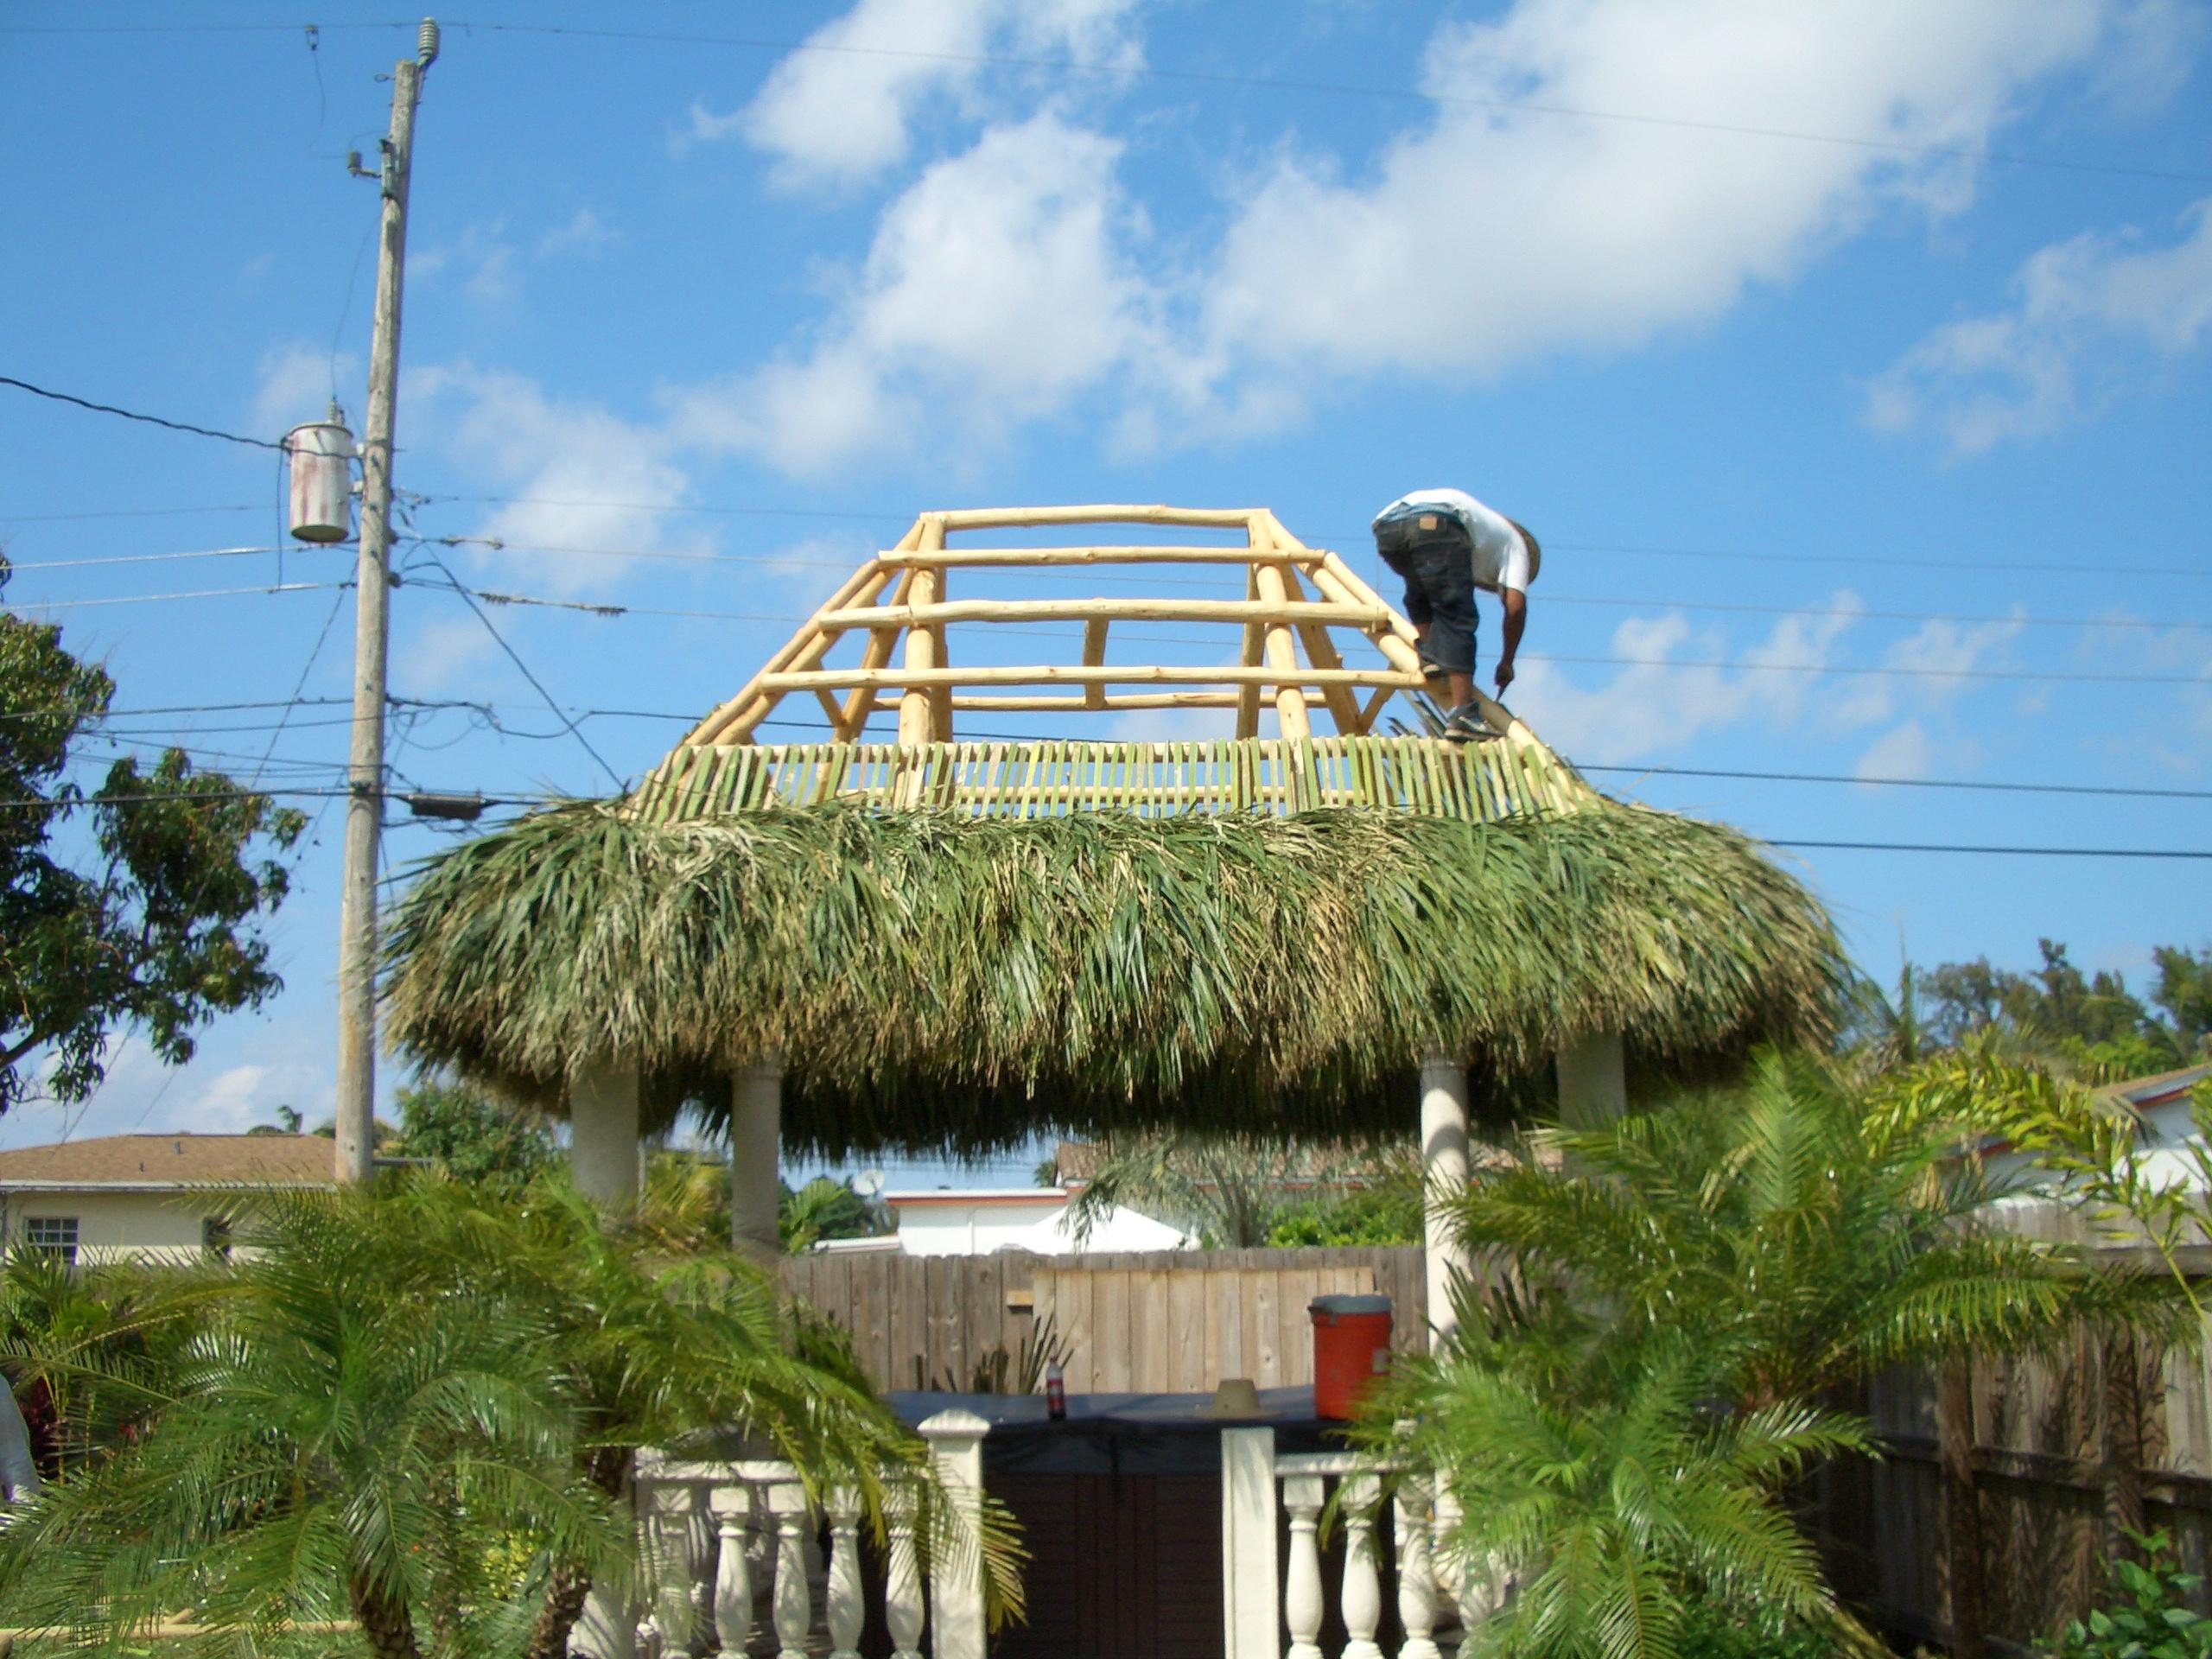 Tiki hut construction 28 images bamboo hut for Leiner jugendzimmer xara